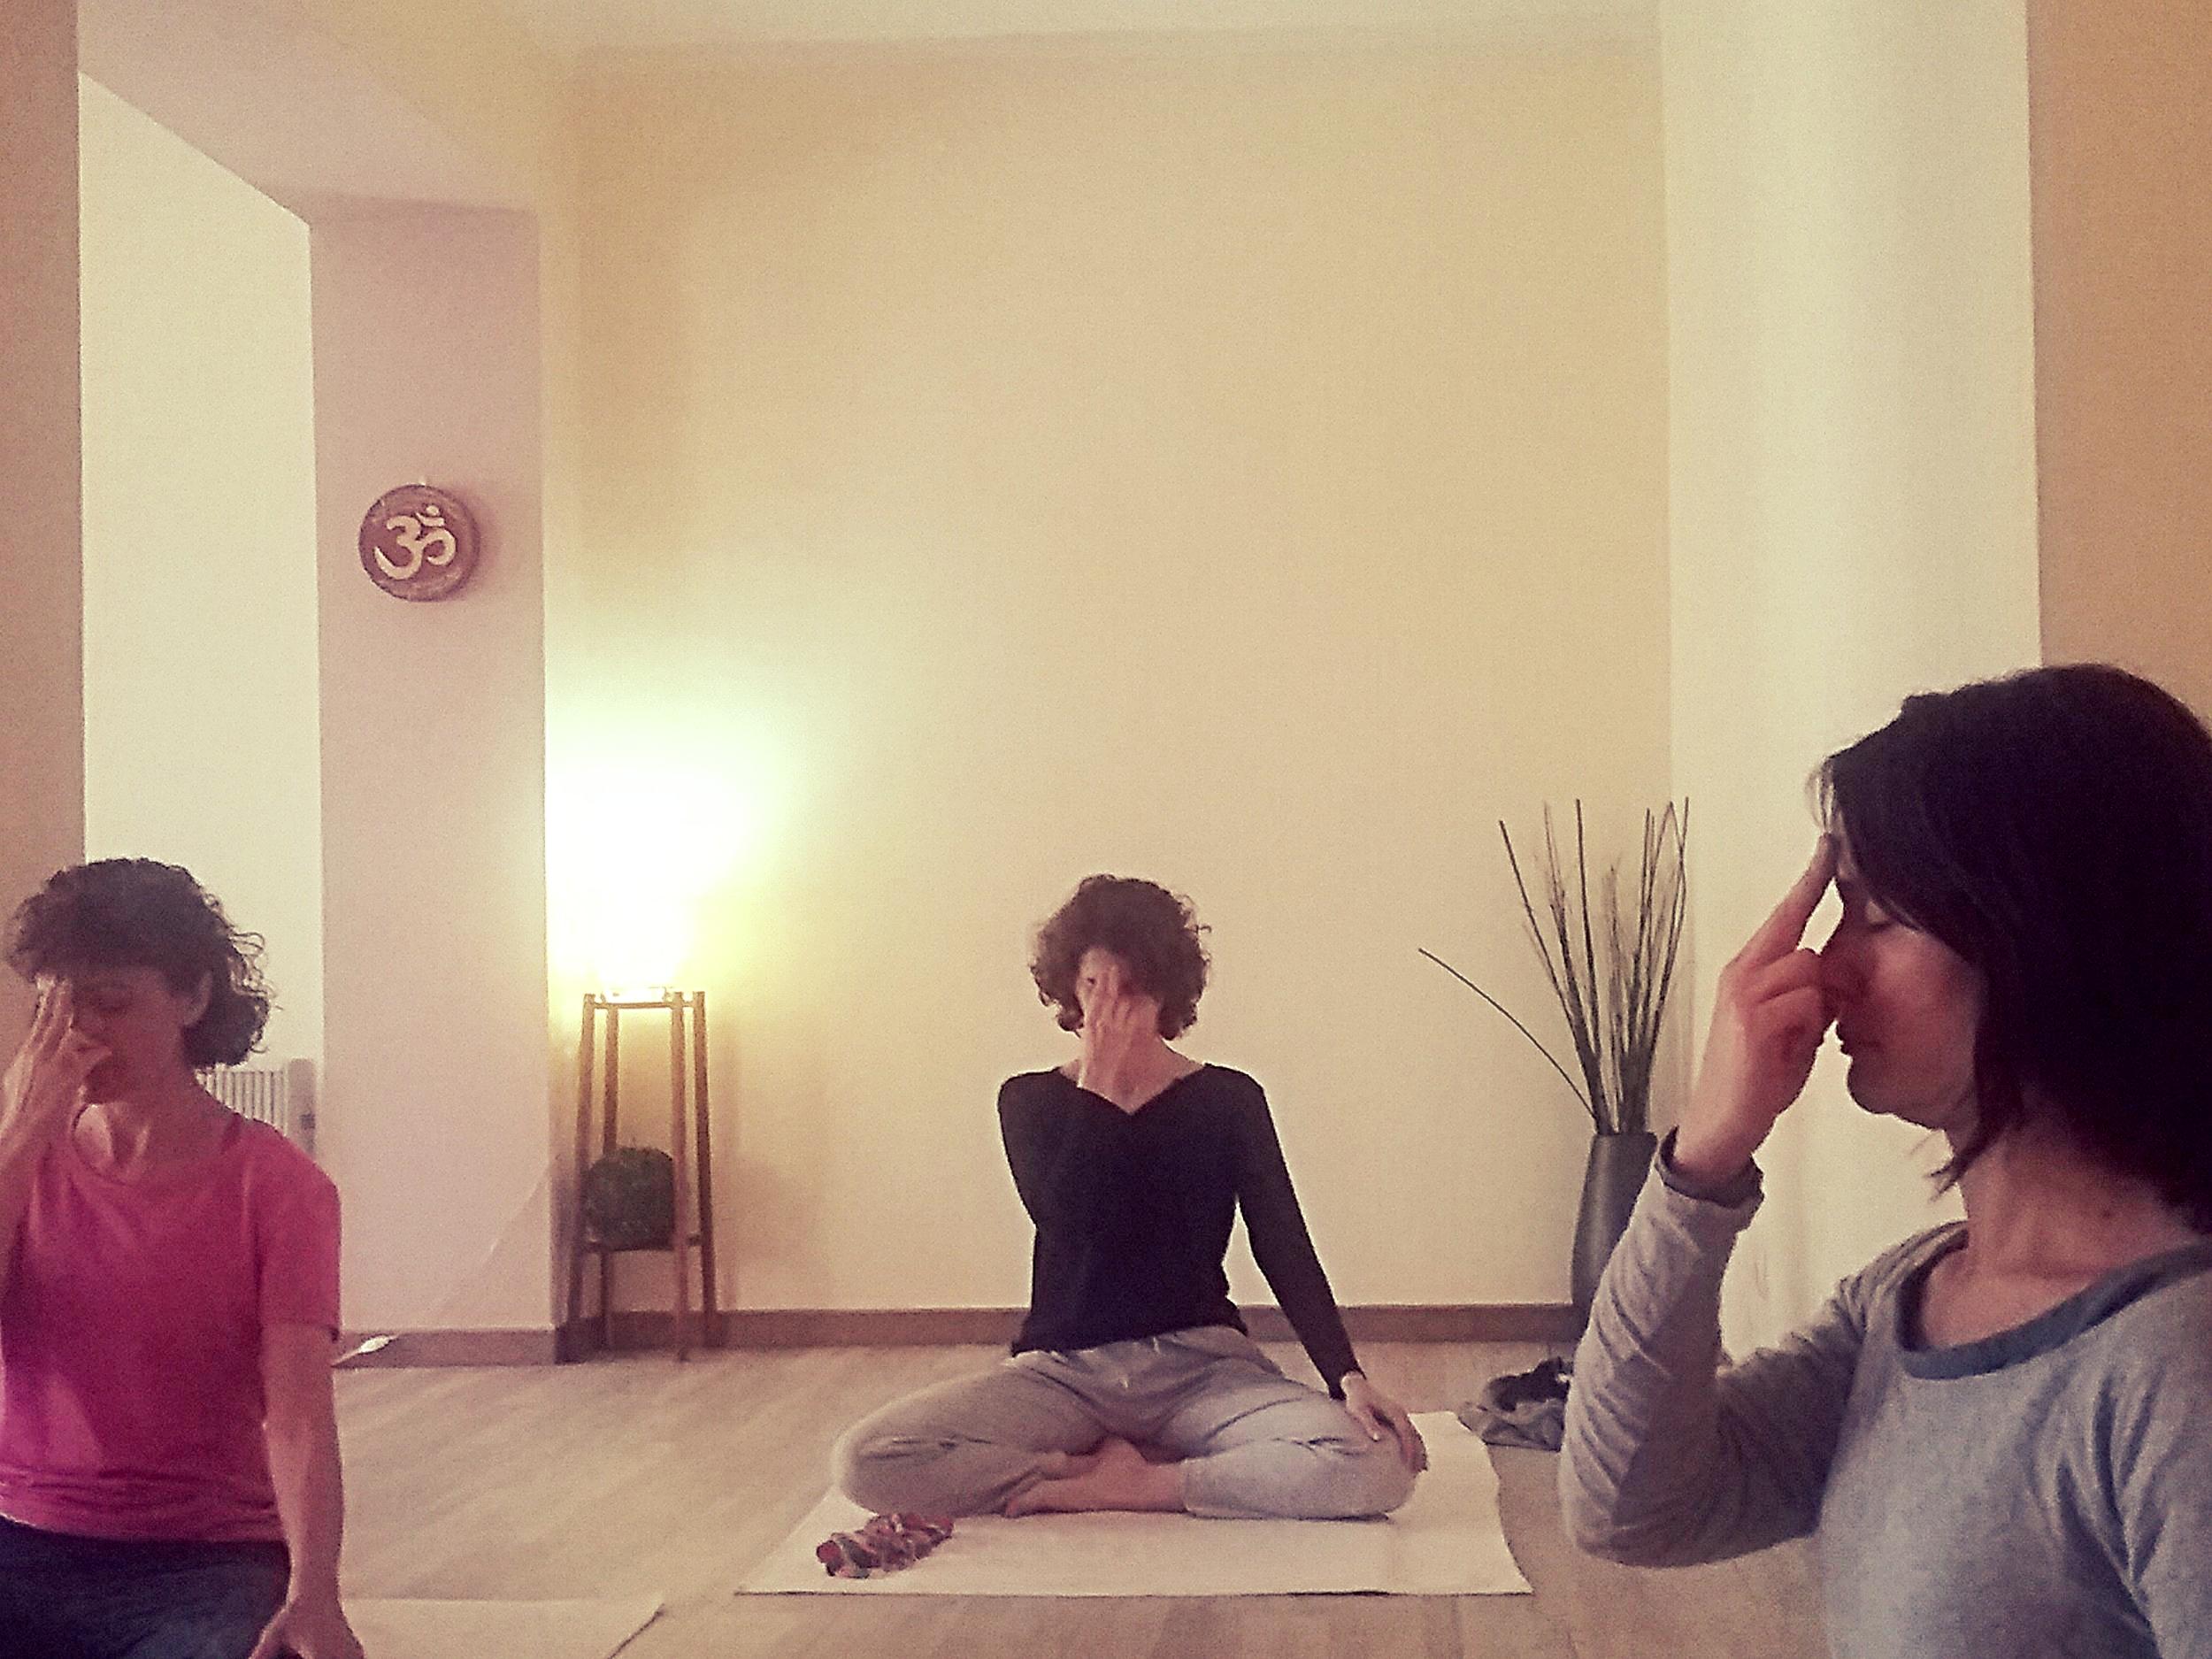 ioga-sants-les-corts-barcelona.jpg